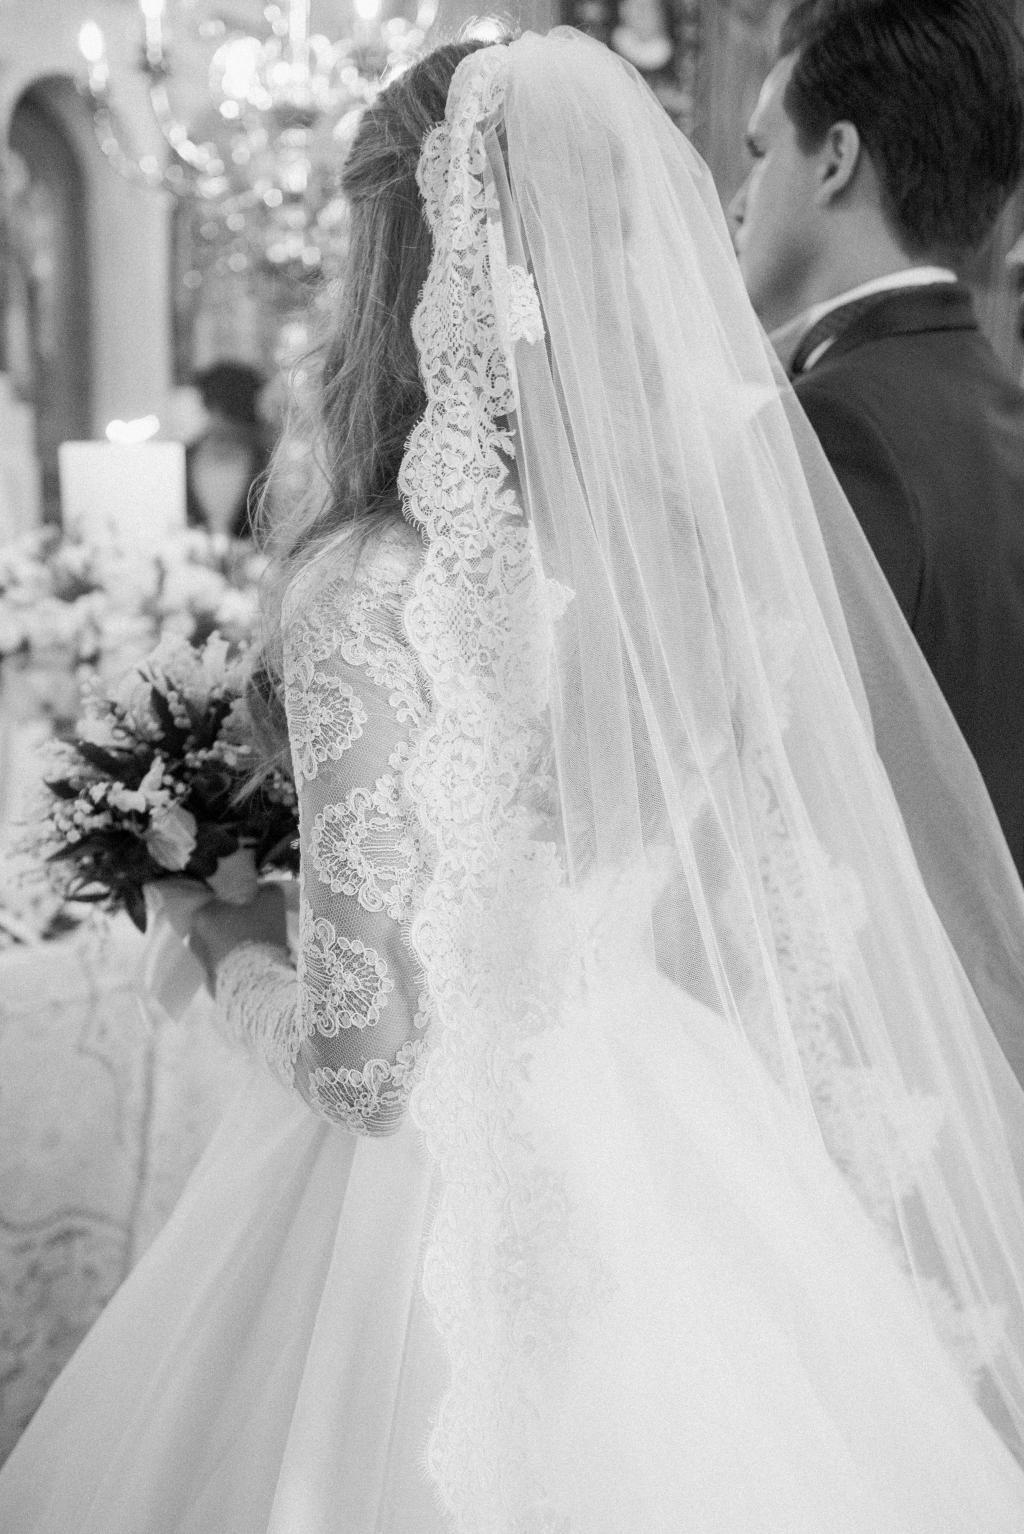 M&K Kavouri wedding - Image 8